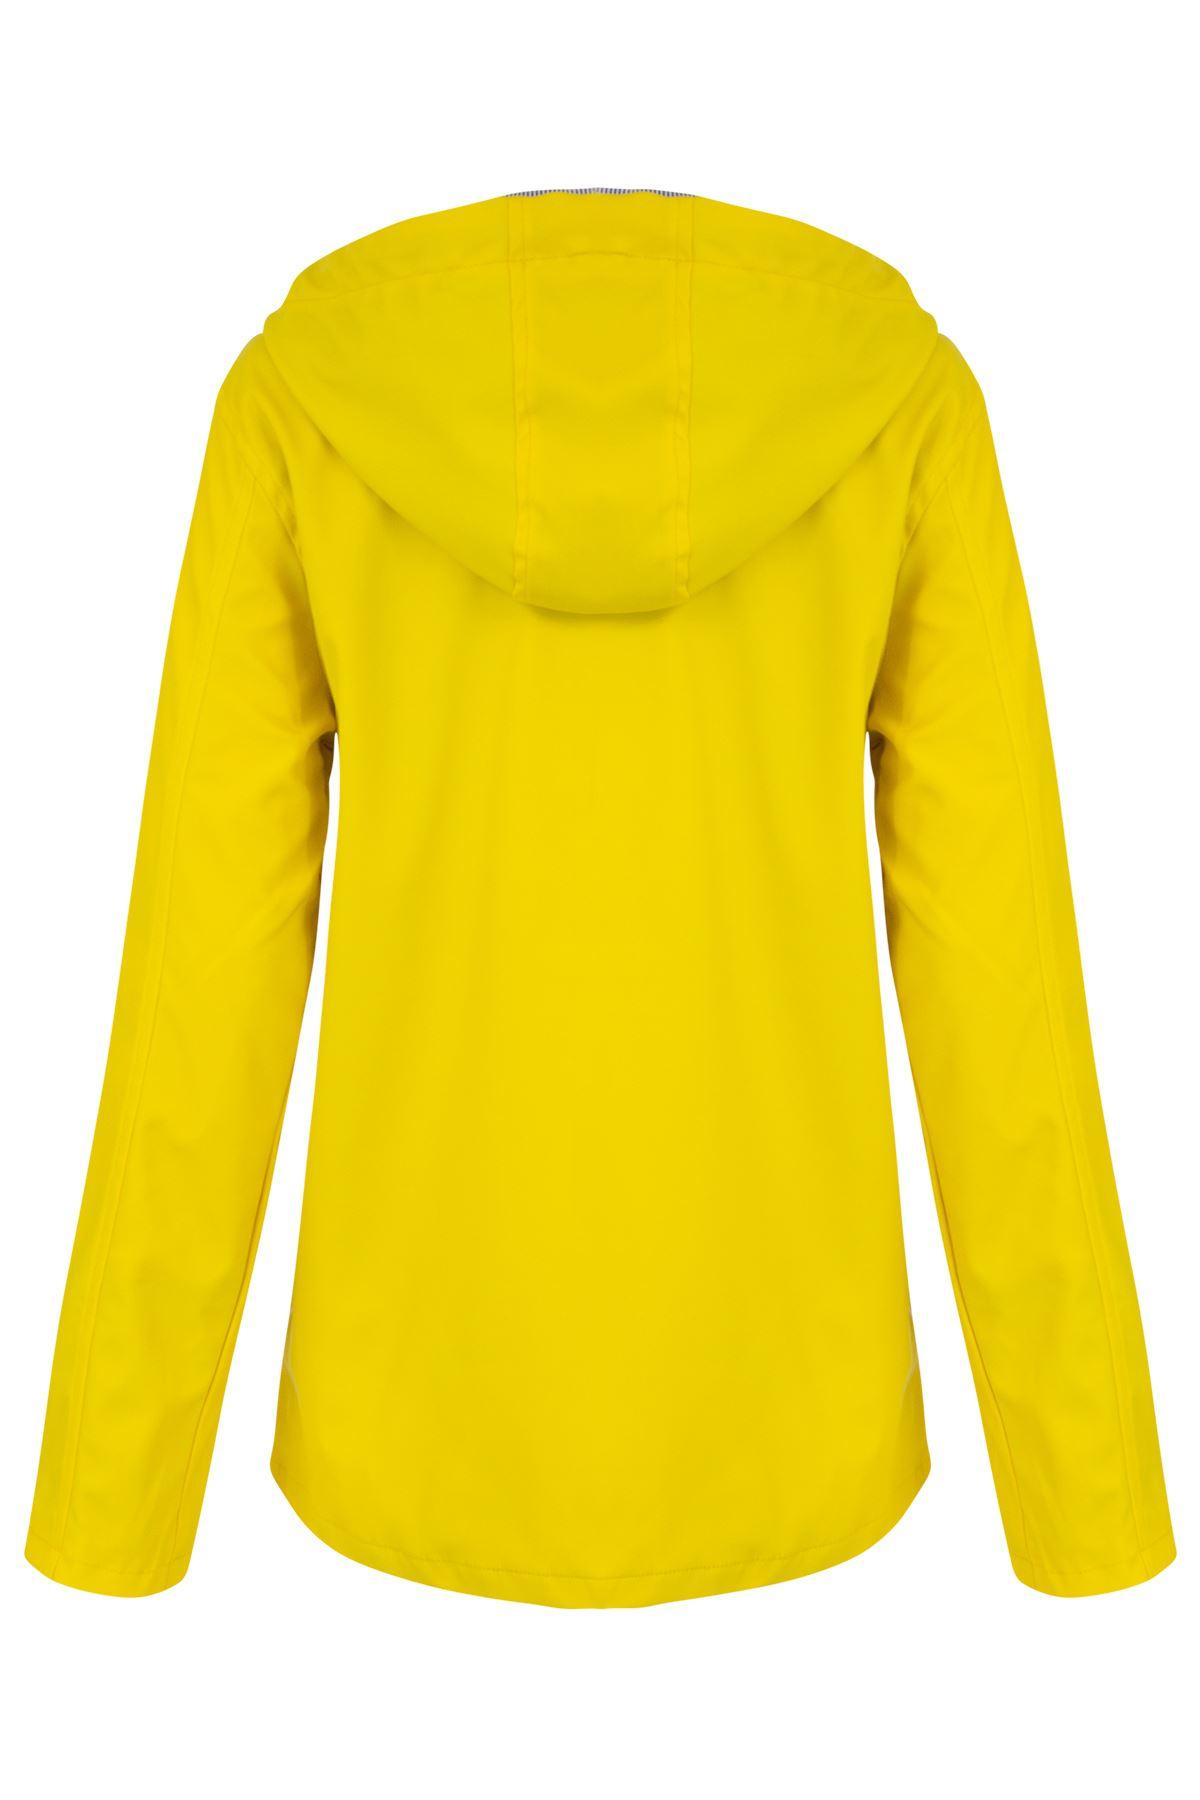 Womens-Ladies-Yellow-Festival-Water-proof-Rain-Outdoor-Mac-Raincoat-Jacket-Size thumbnail 8